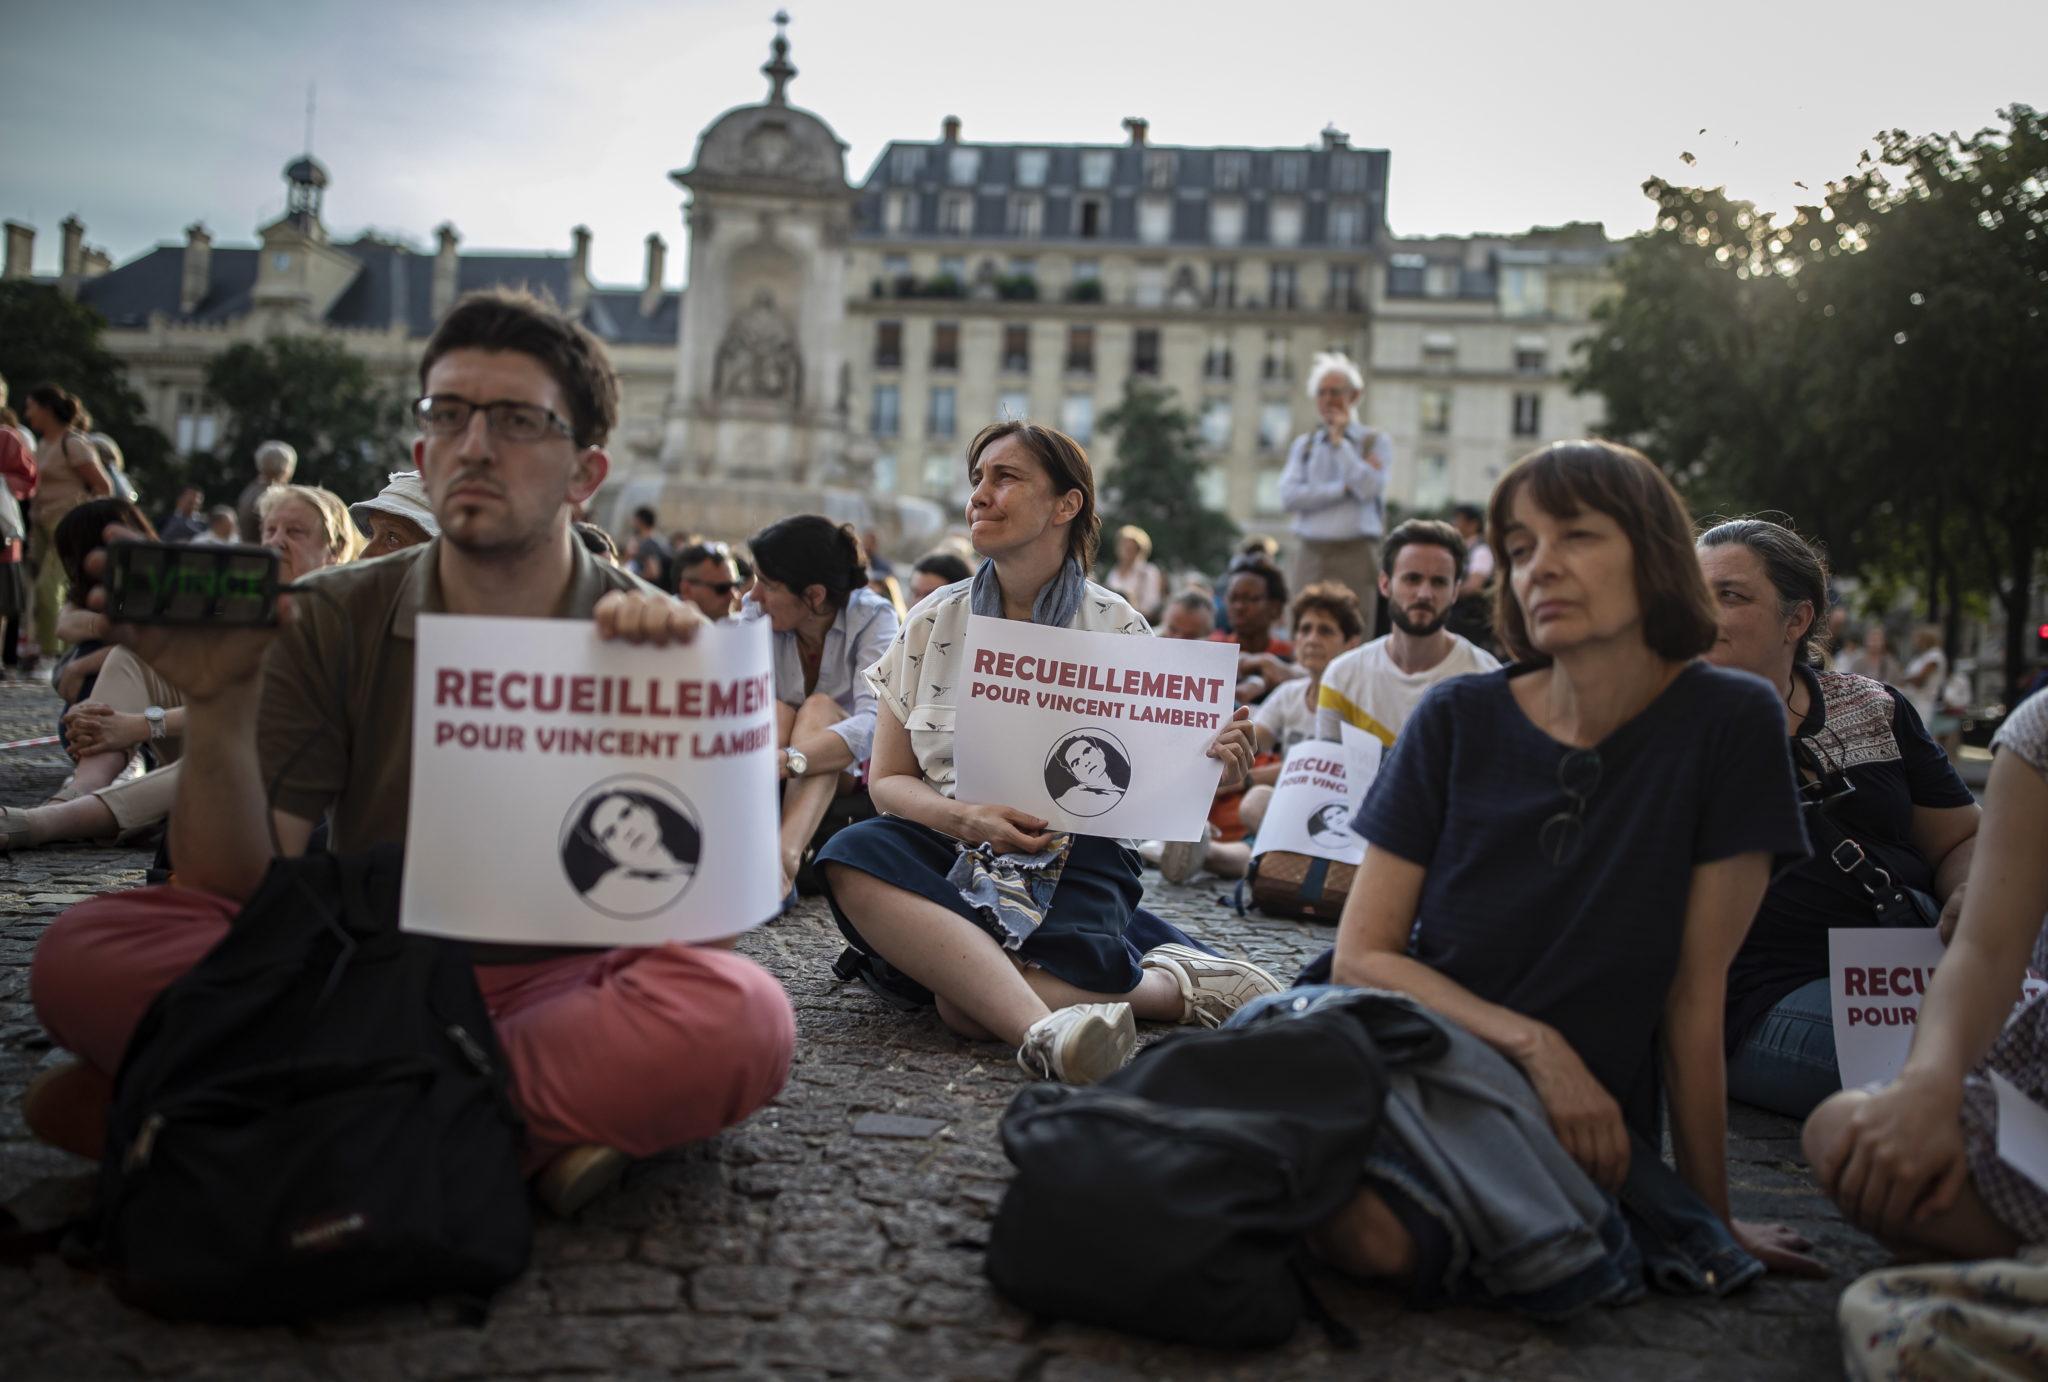 Modlitwa za zmarłego Vincenta Lamberta, Paryż, fot. IAN LANGSDON, PAP/EPA